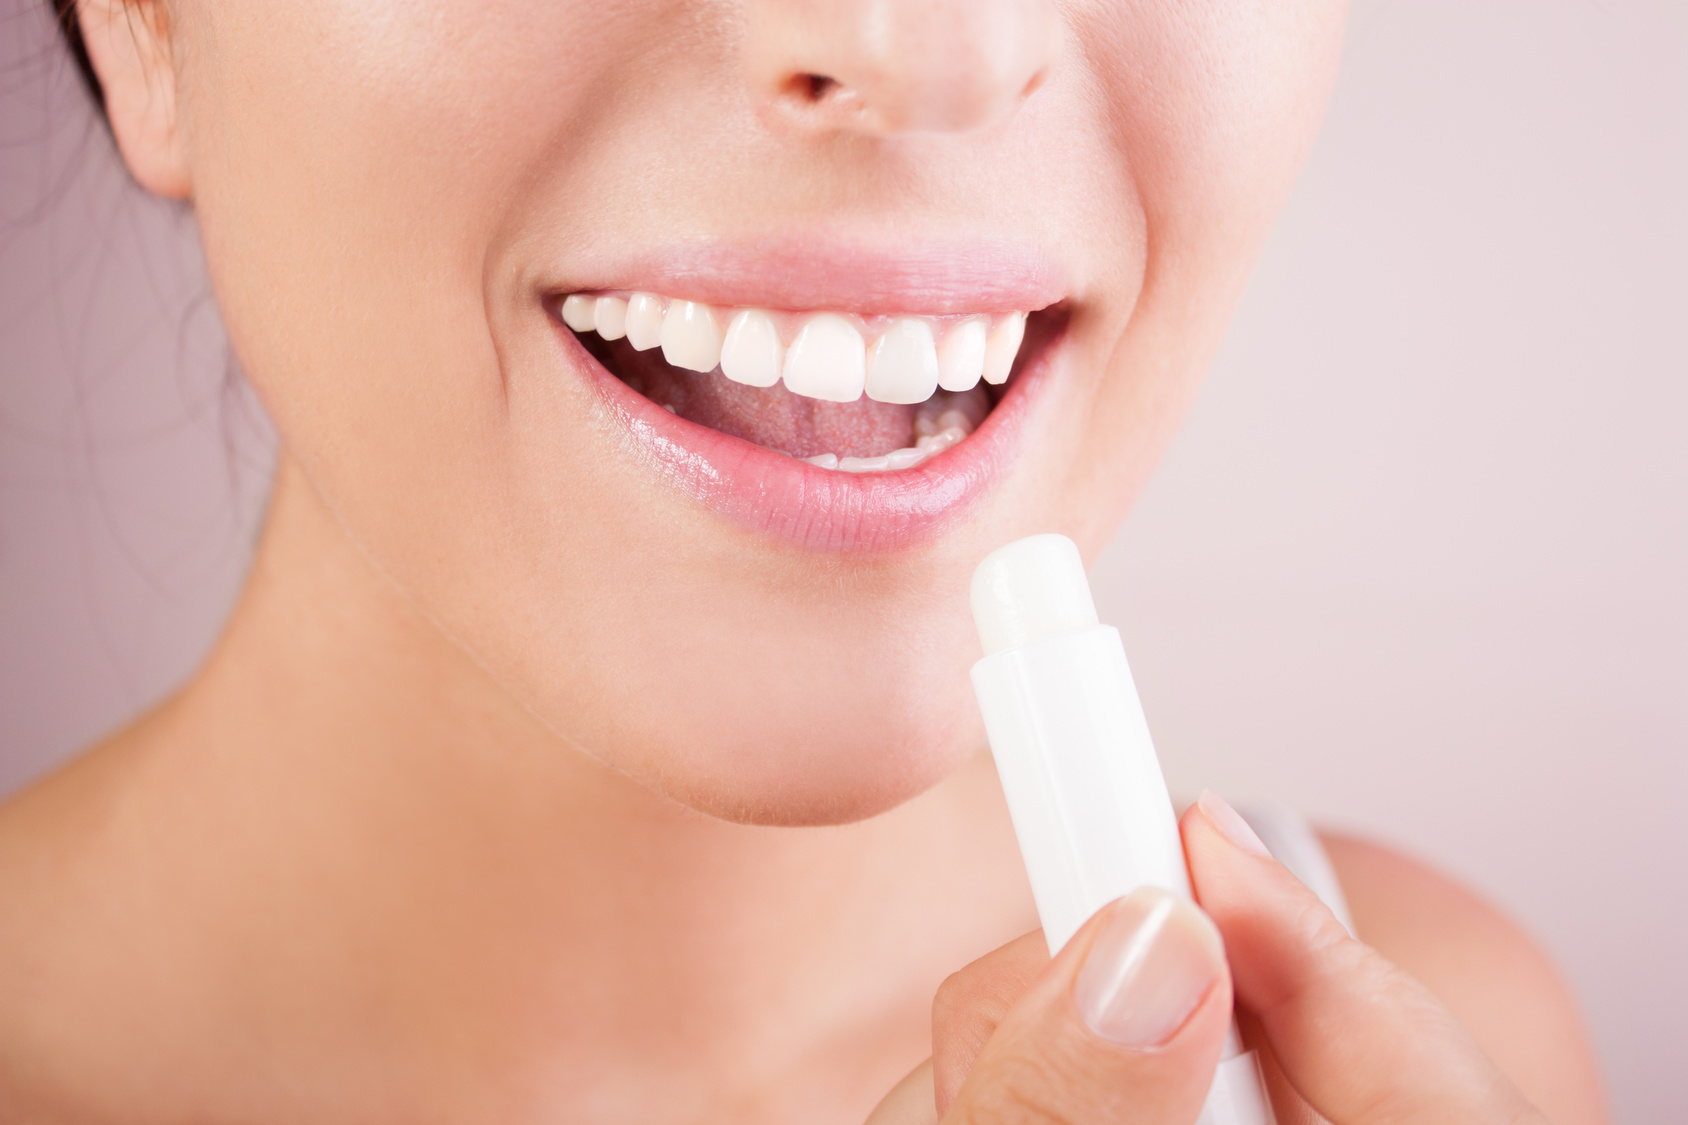 Lips care.woman applying balsam on lips